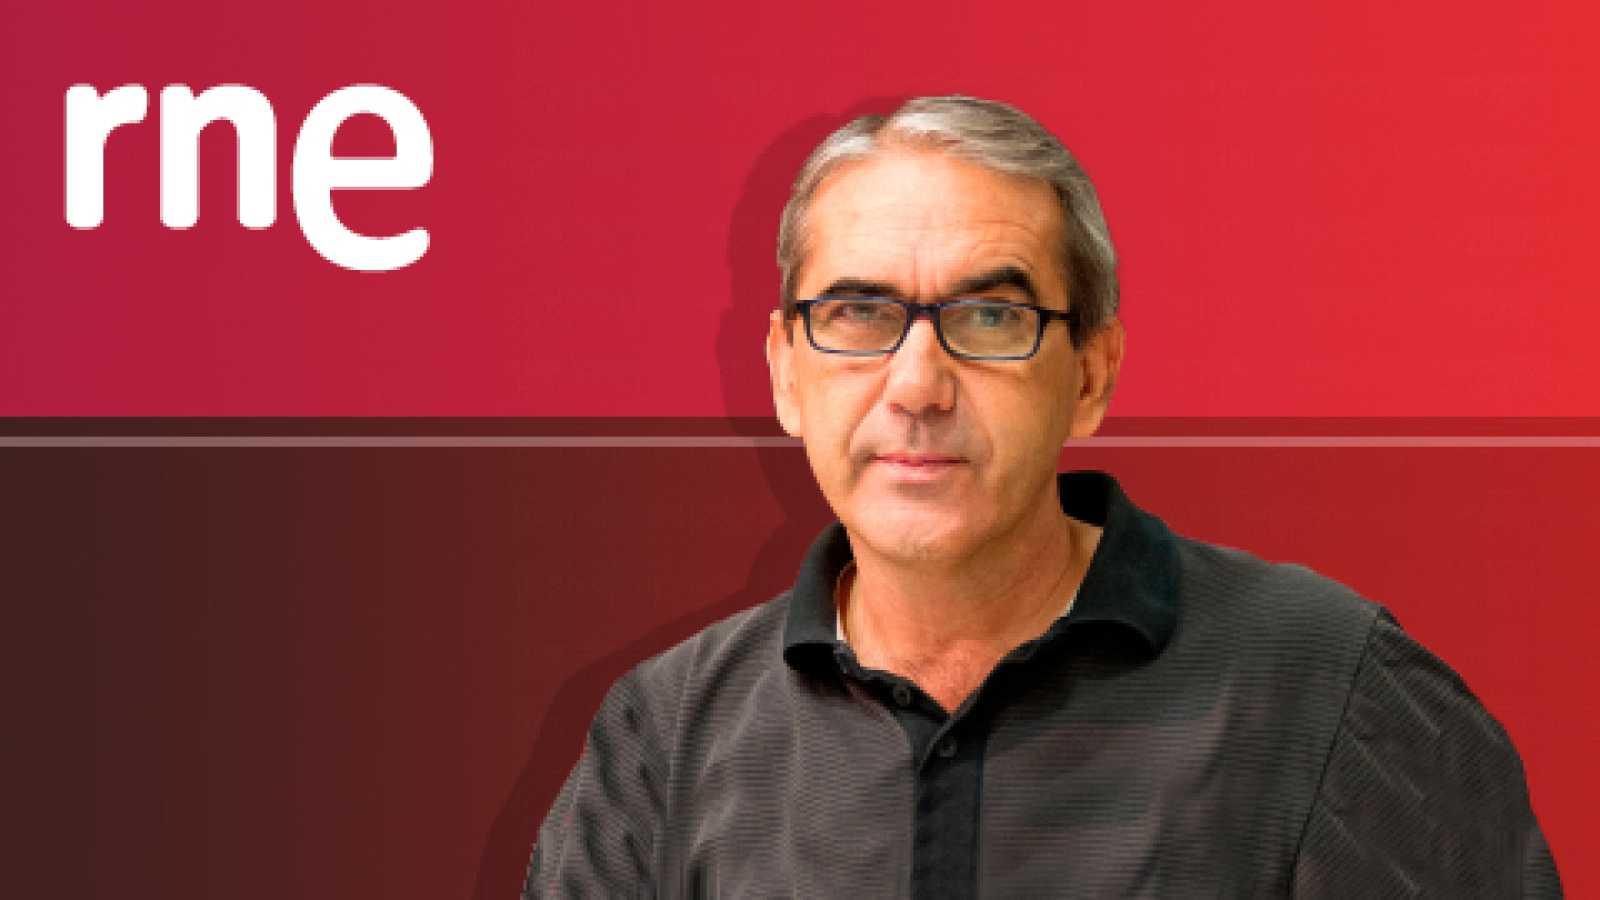 Historias de papel - 18/10/20 - Andrea Abreu, Juan Eslava Galán, Jaime Cedillo